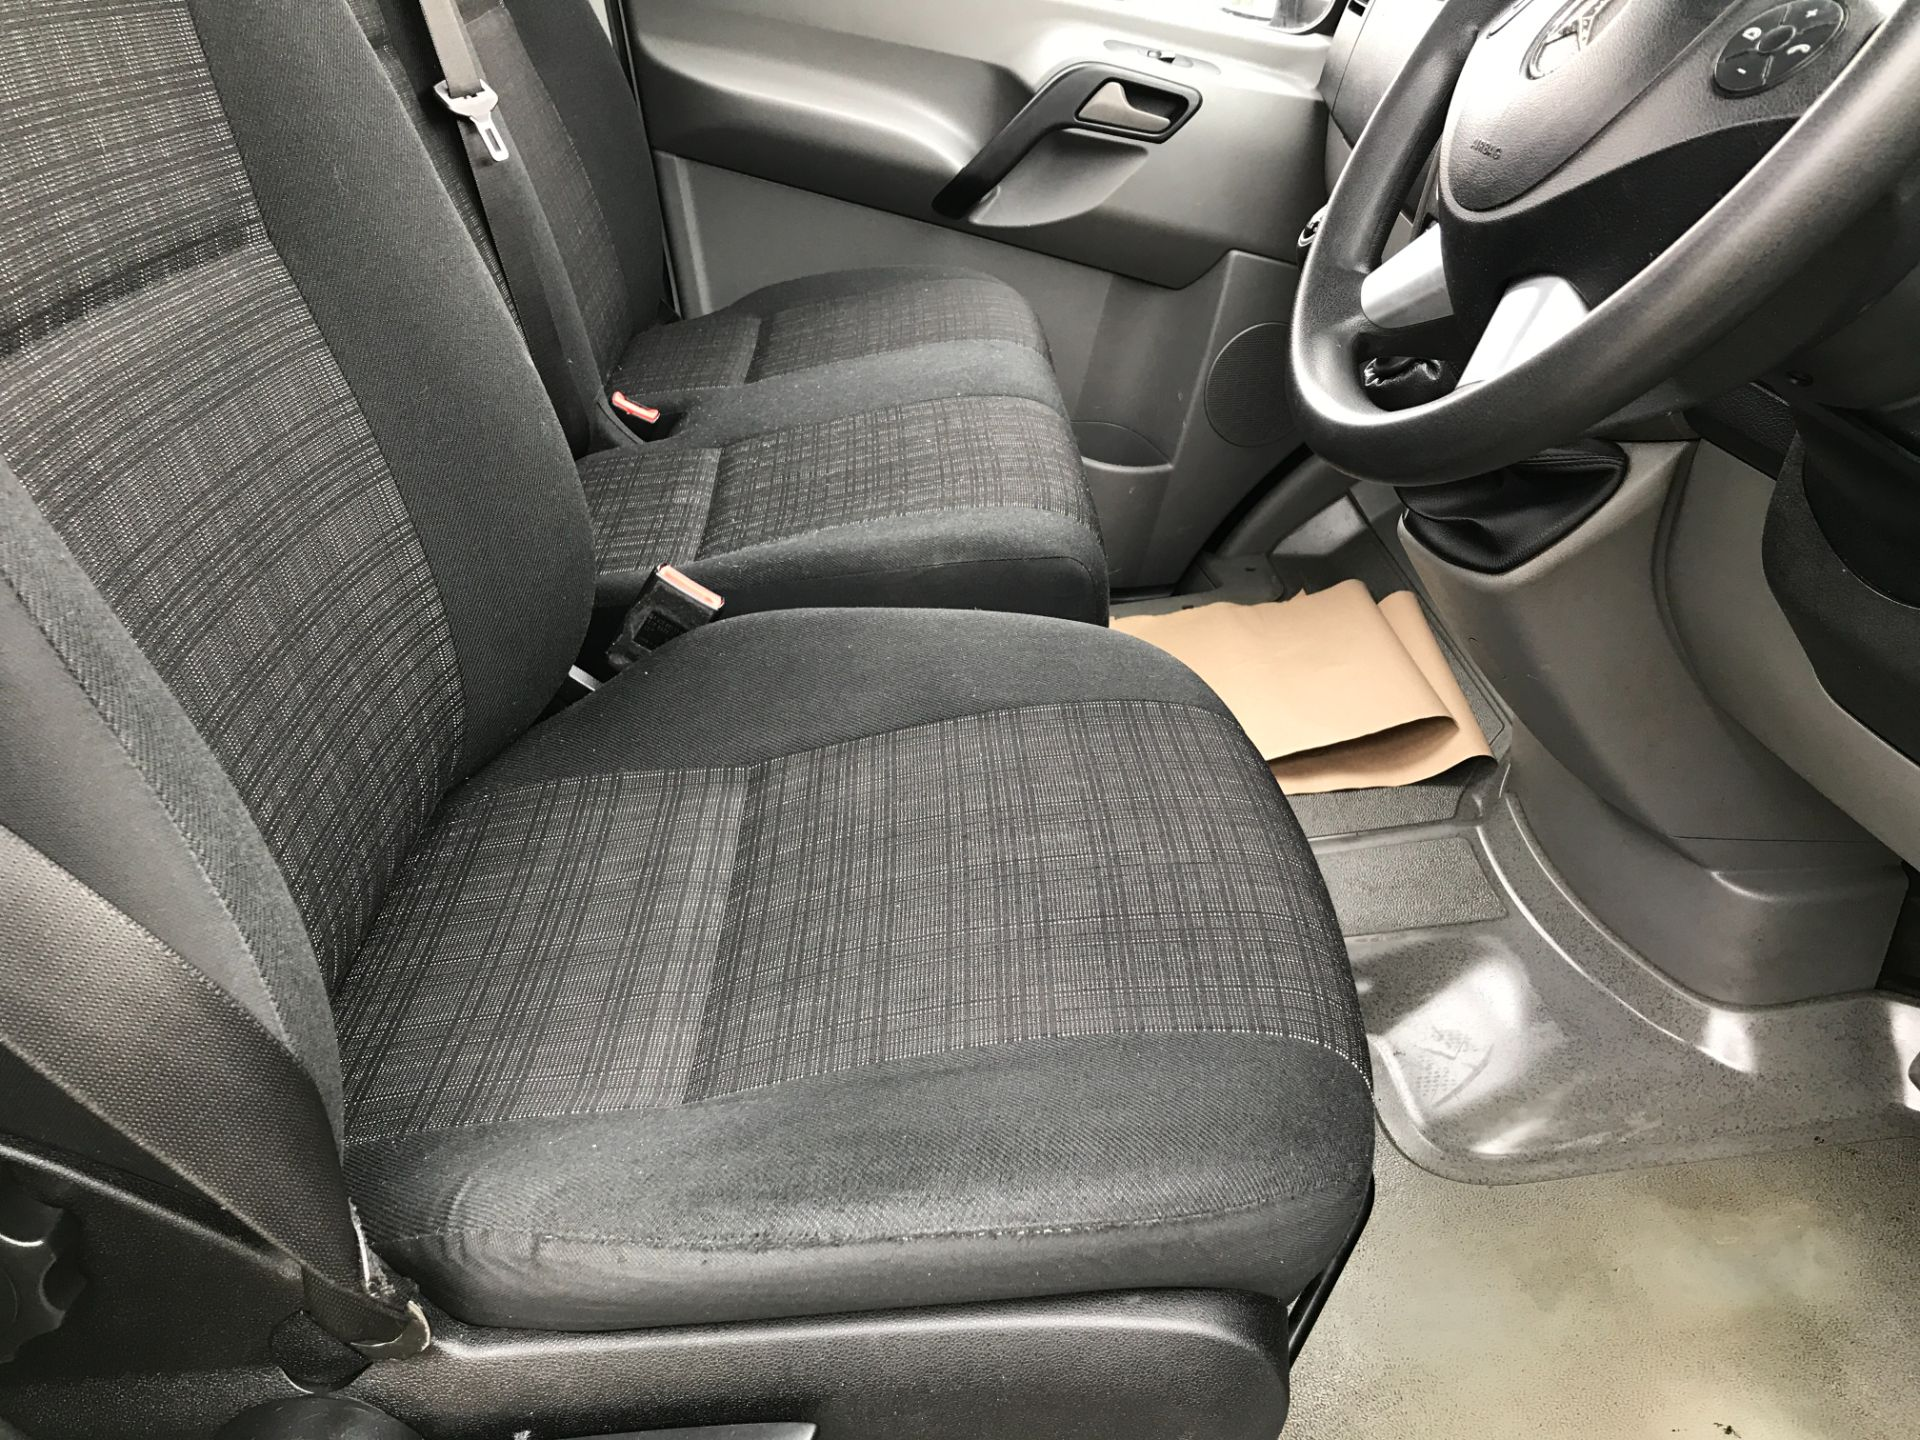 2017 Mercedes-Benz Sprinter 314CDI 13FT DROPSIDE 140PS EURO 6 (KN17OBS) Image 7